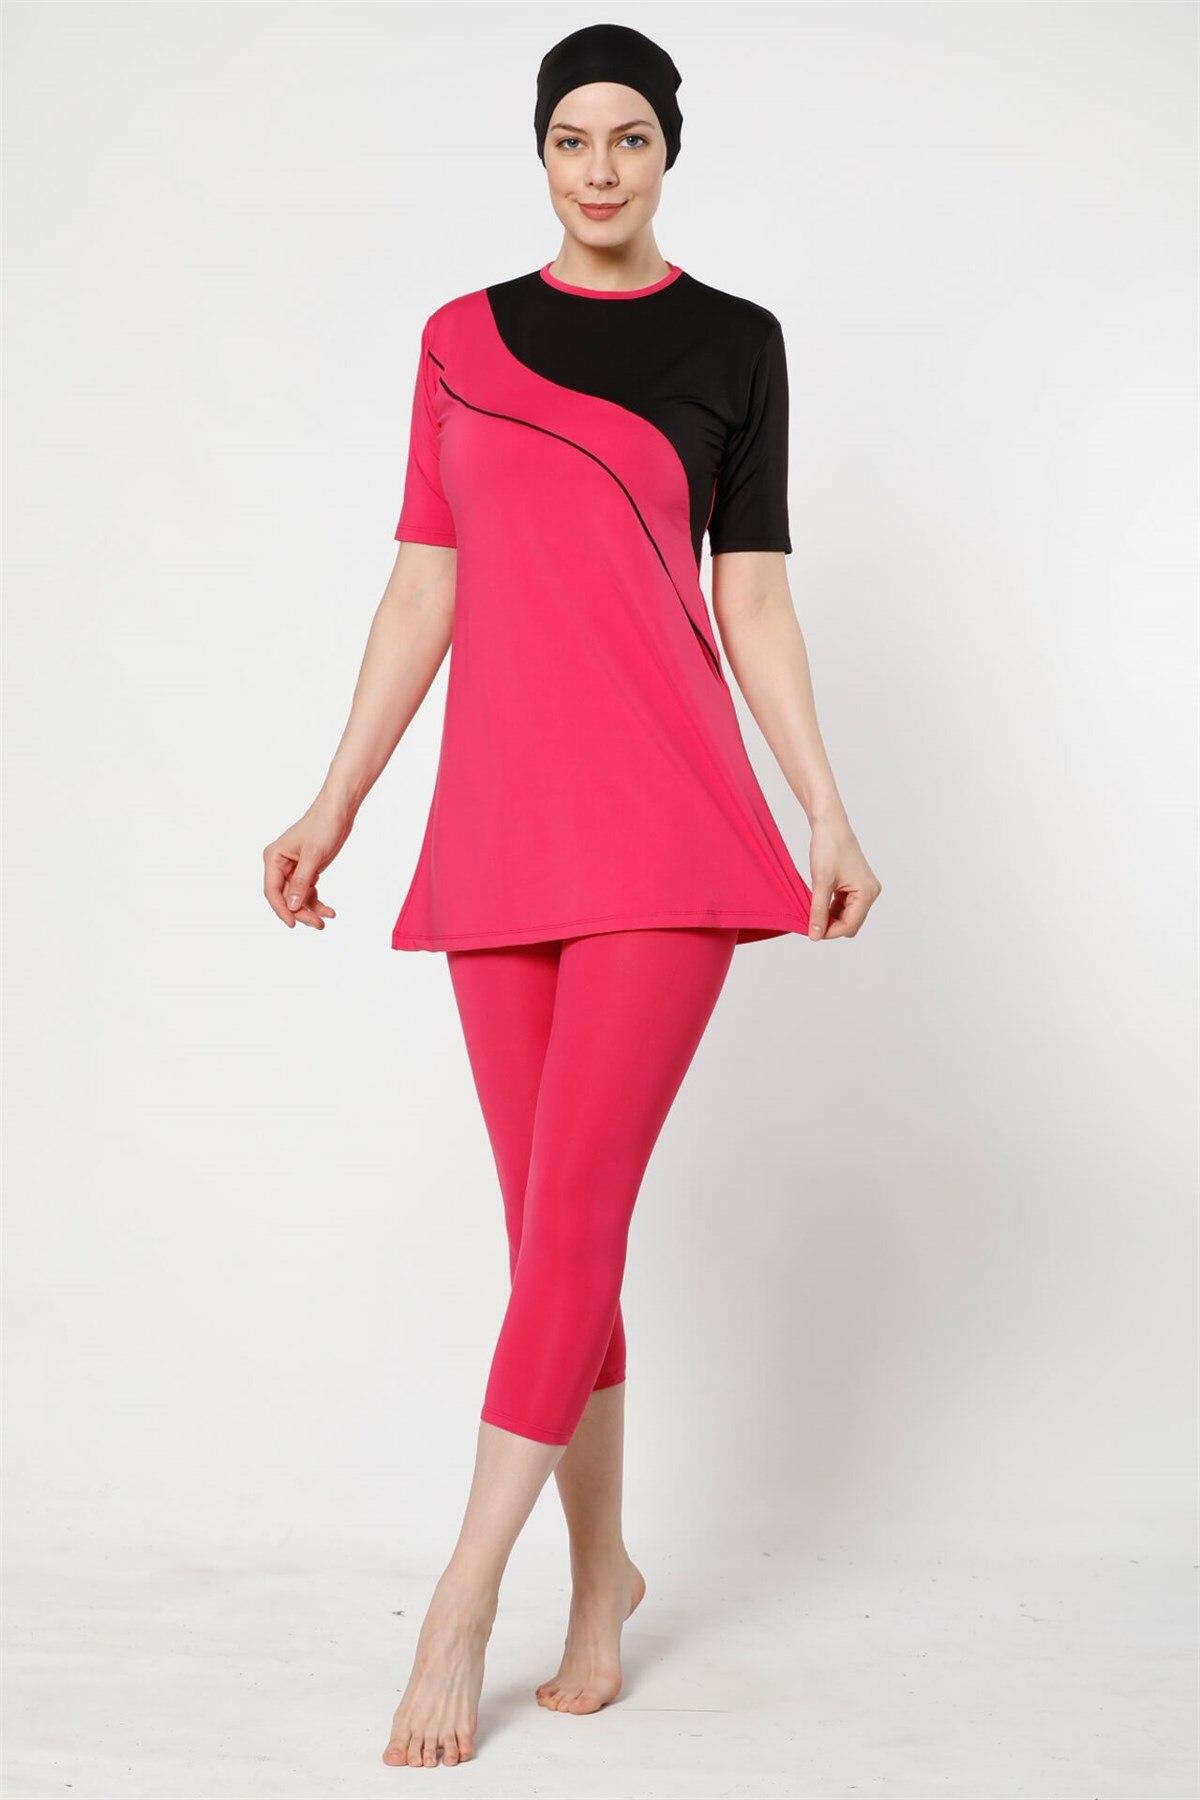 Fashion Cartoon Half Off The Tights Lycra Short Sleeve Hijab swimwear 28021